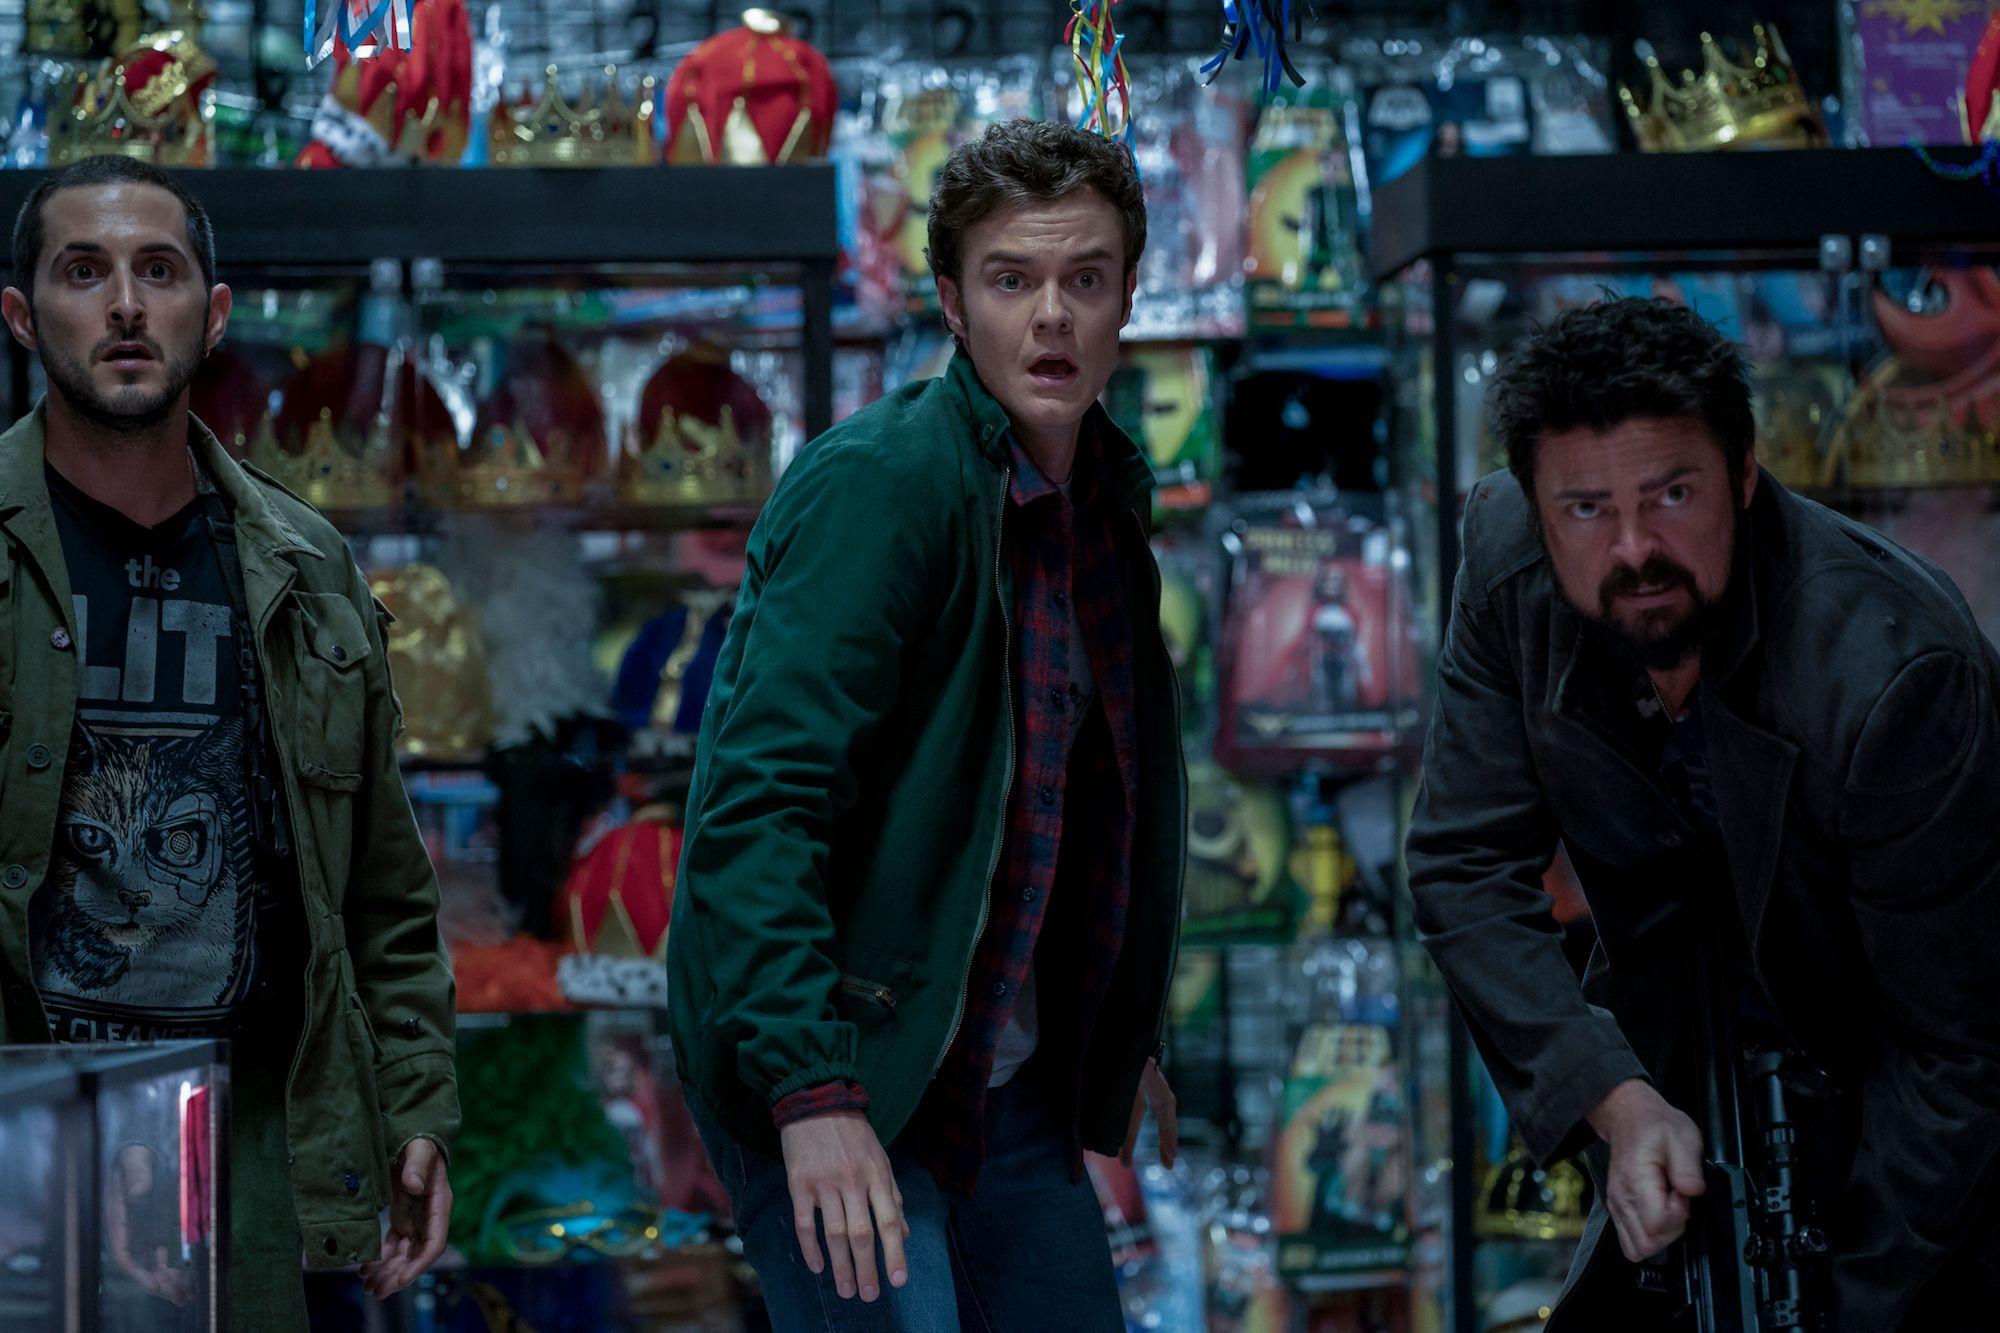 The Boys Creator on Season 2, Episode 4: Homelander and Scientology |  Collider